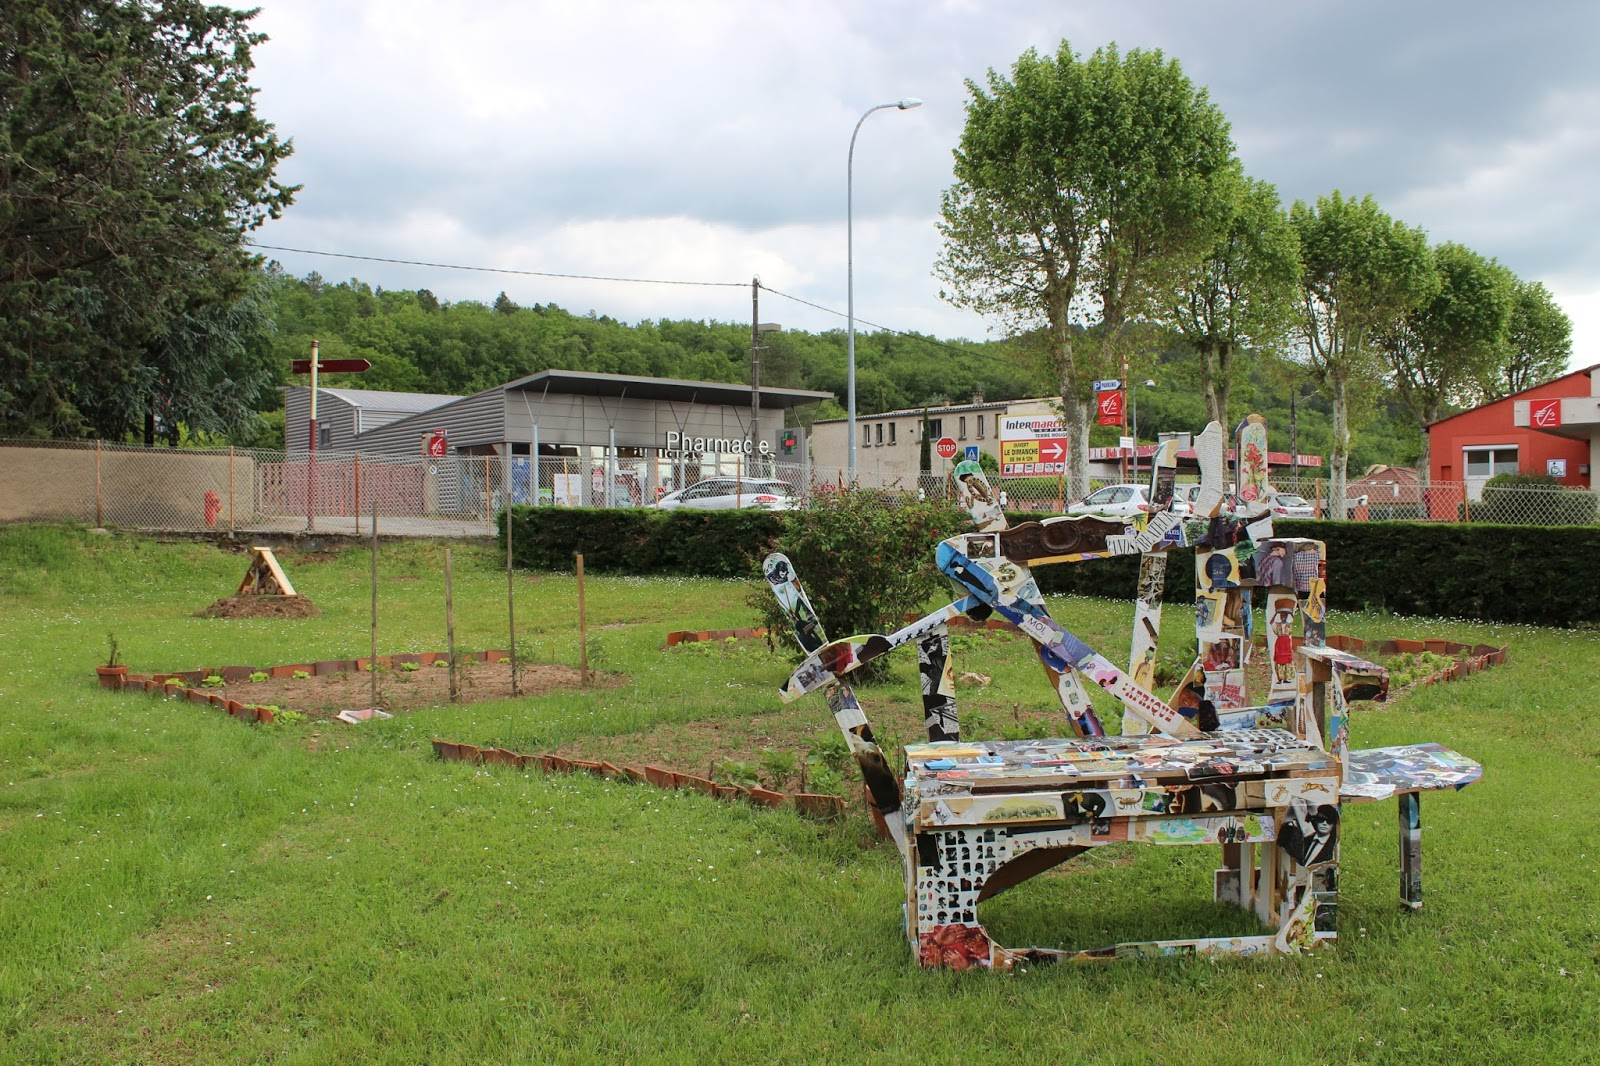 Cahors juin jardins le festival qui cultive l 39 art a for Cahors jardin juin 2015